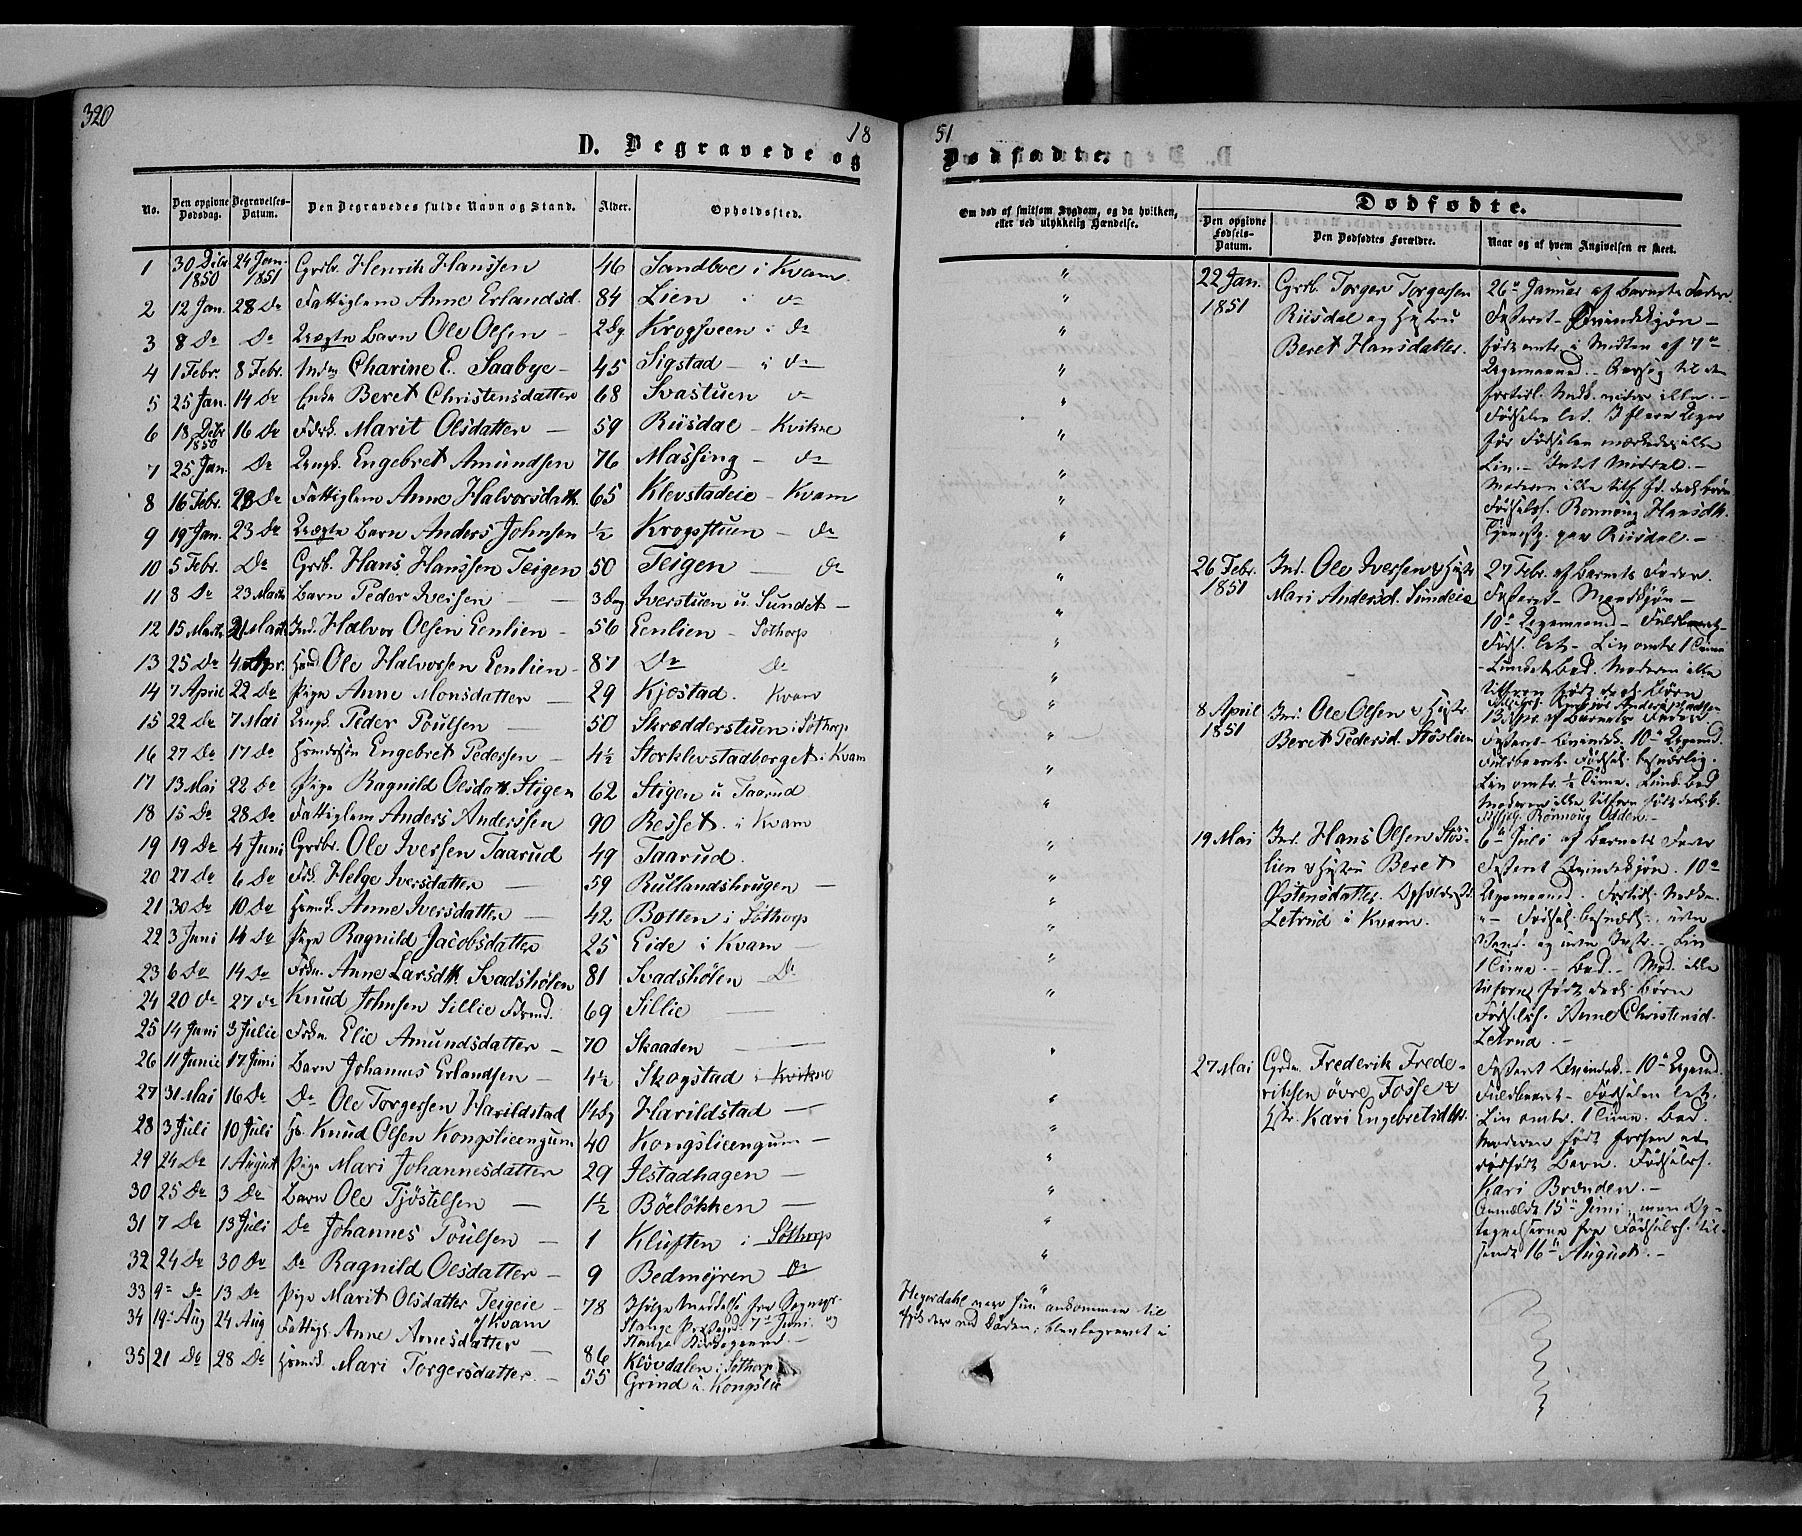 SAH, Nord-Fron prestekontor, Ministerialbok nr. 1, 1851-1864, s. 320